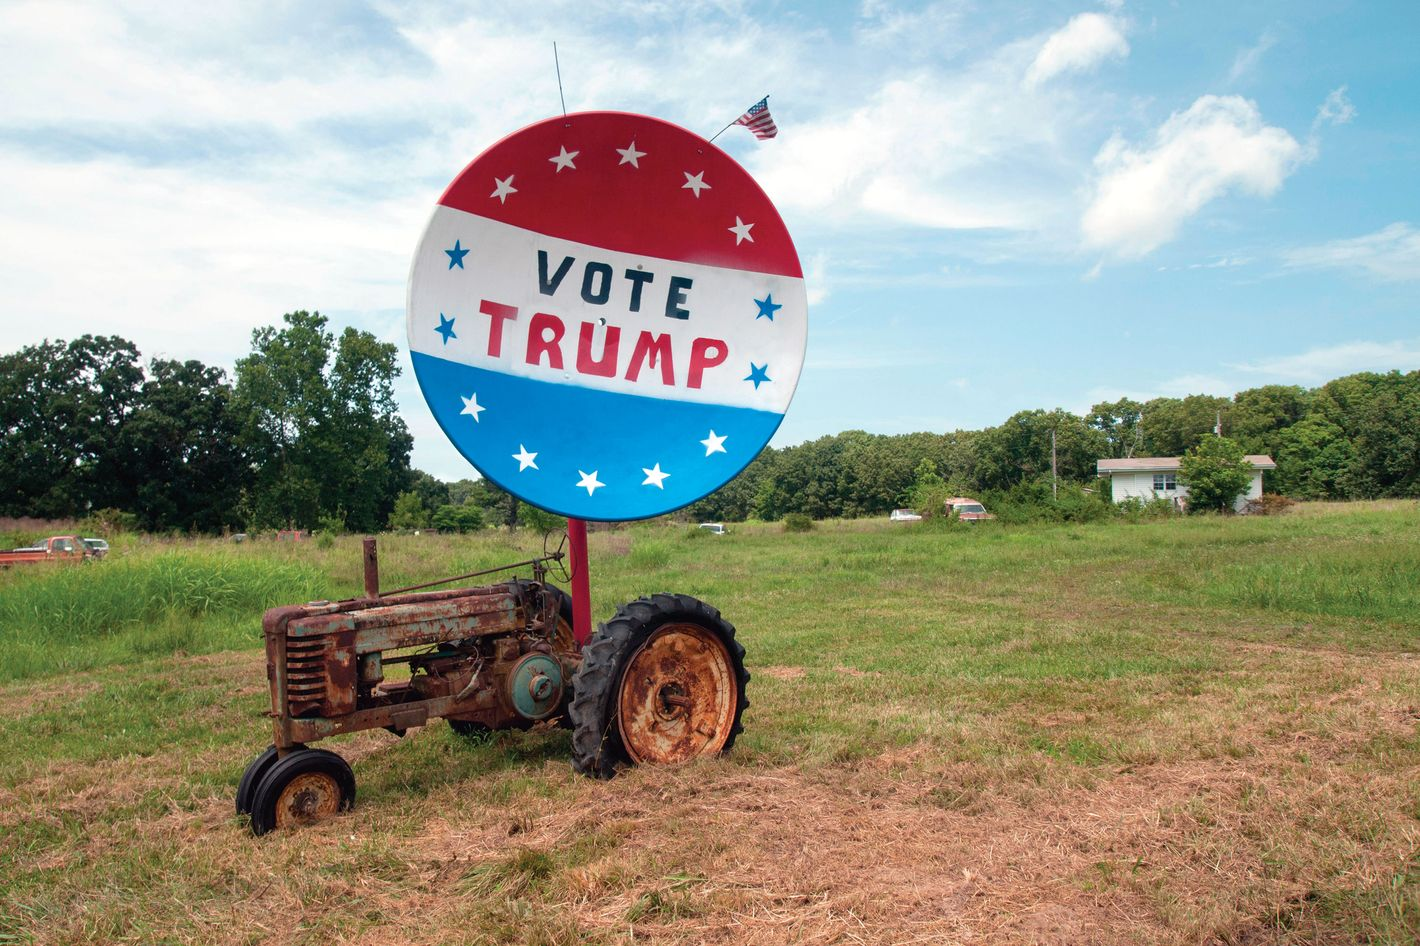 Frank Rich: No Sympathy for the Hillbilly